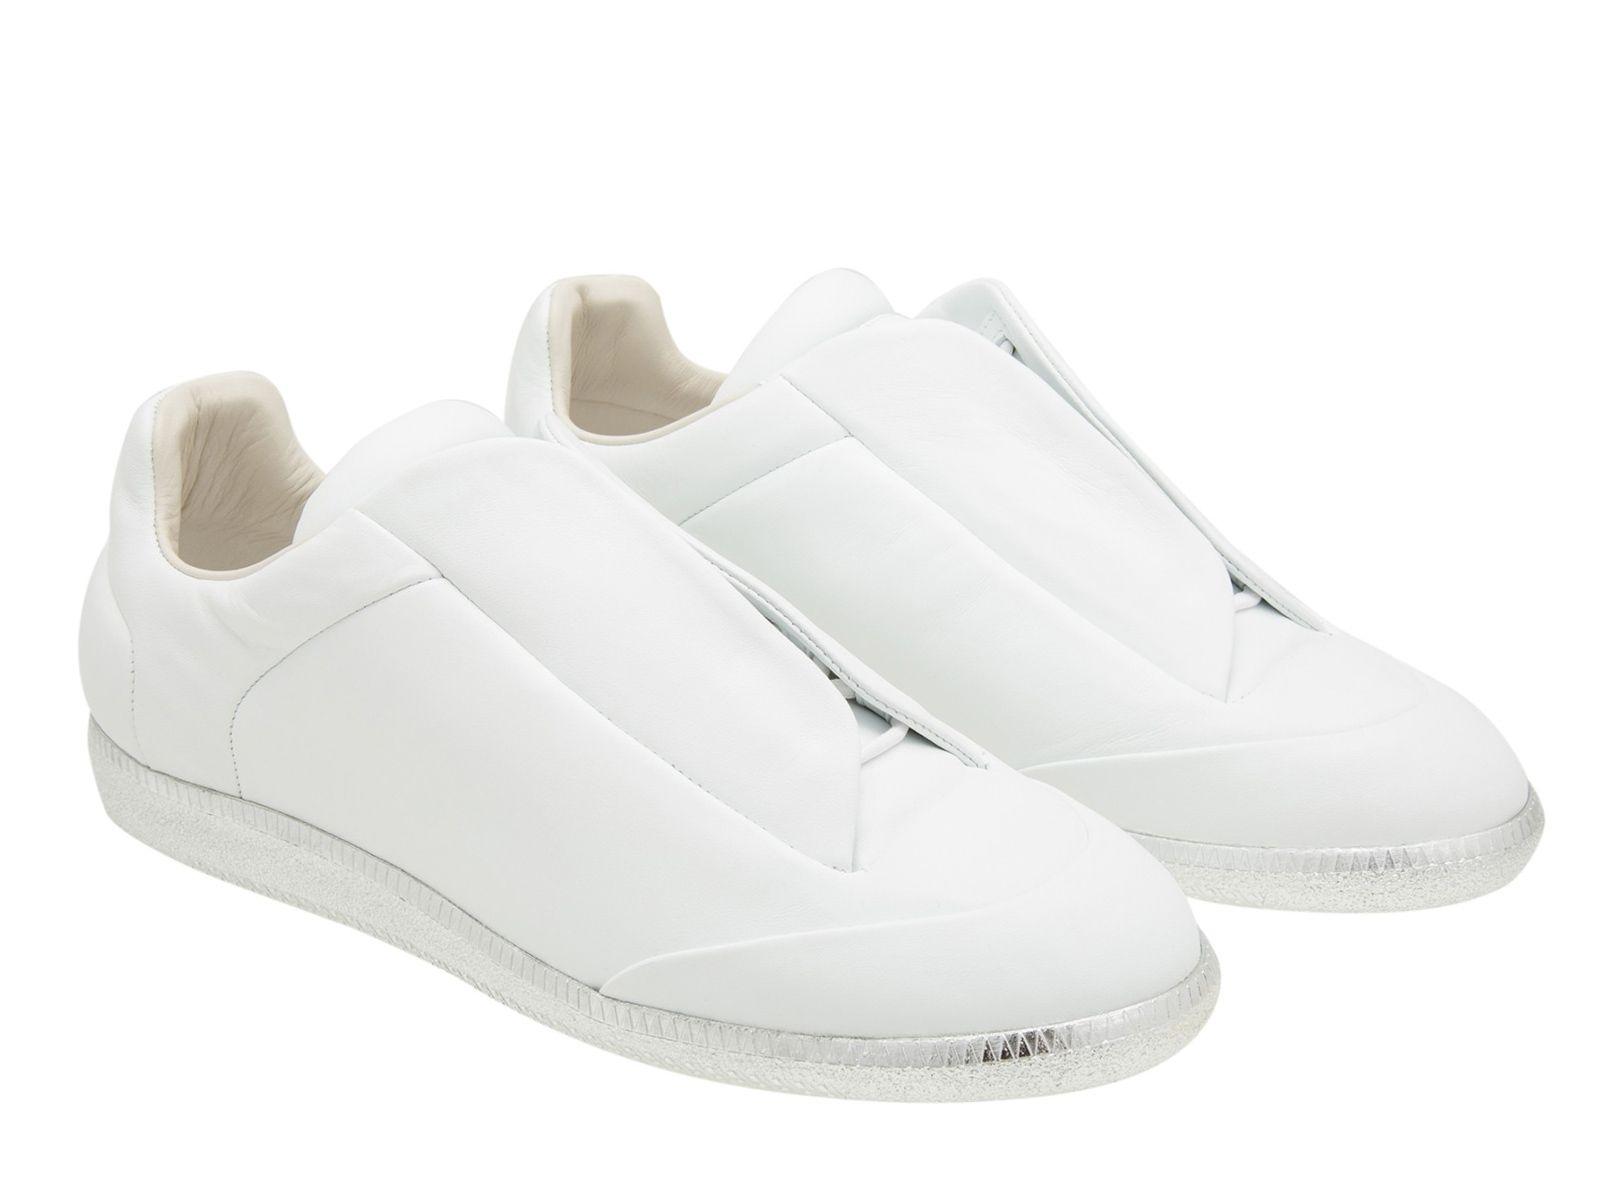 Maison Margiela men's sneakers in white